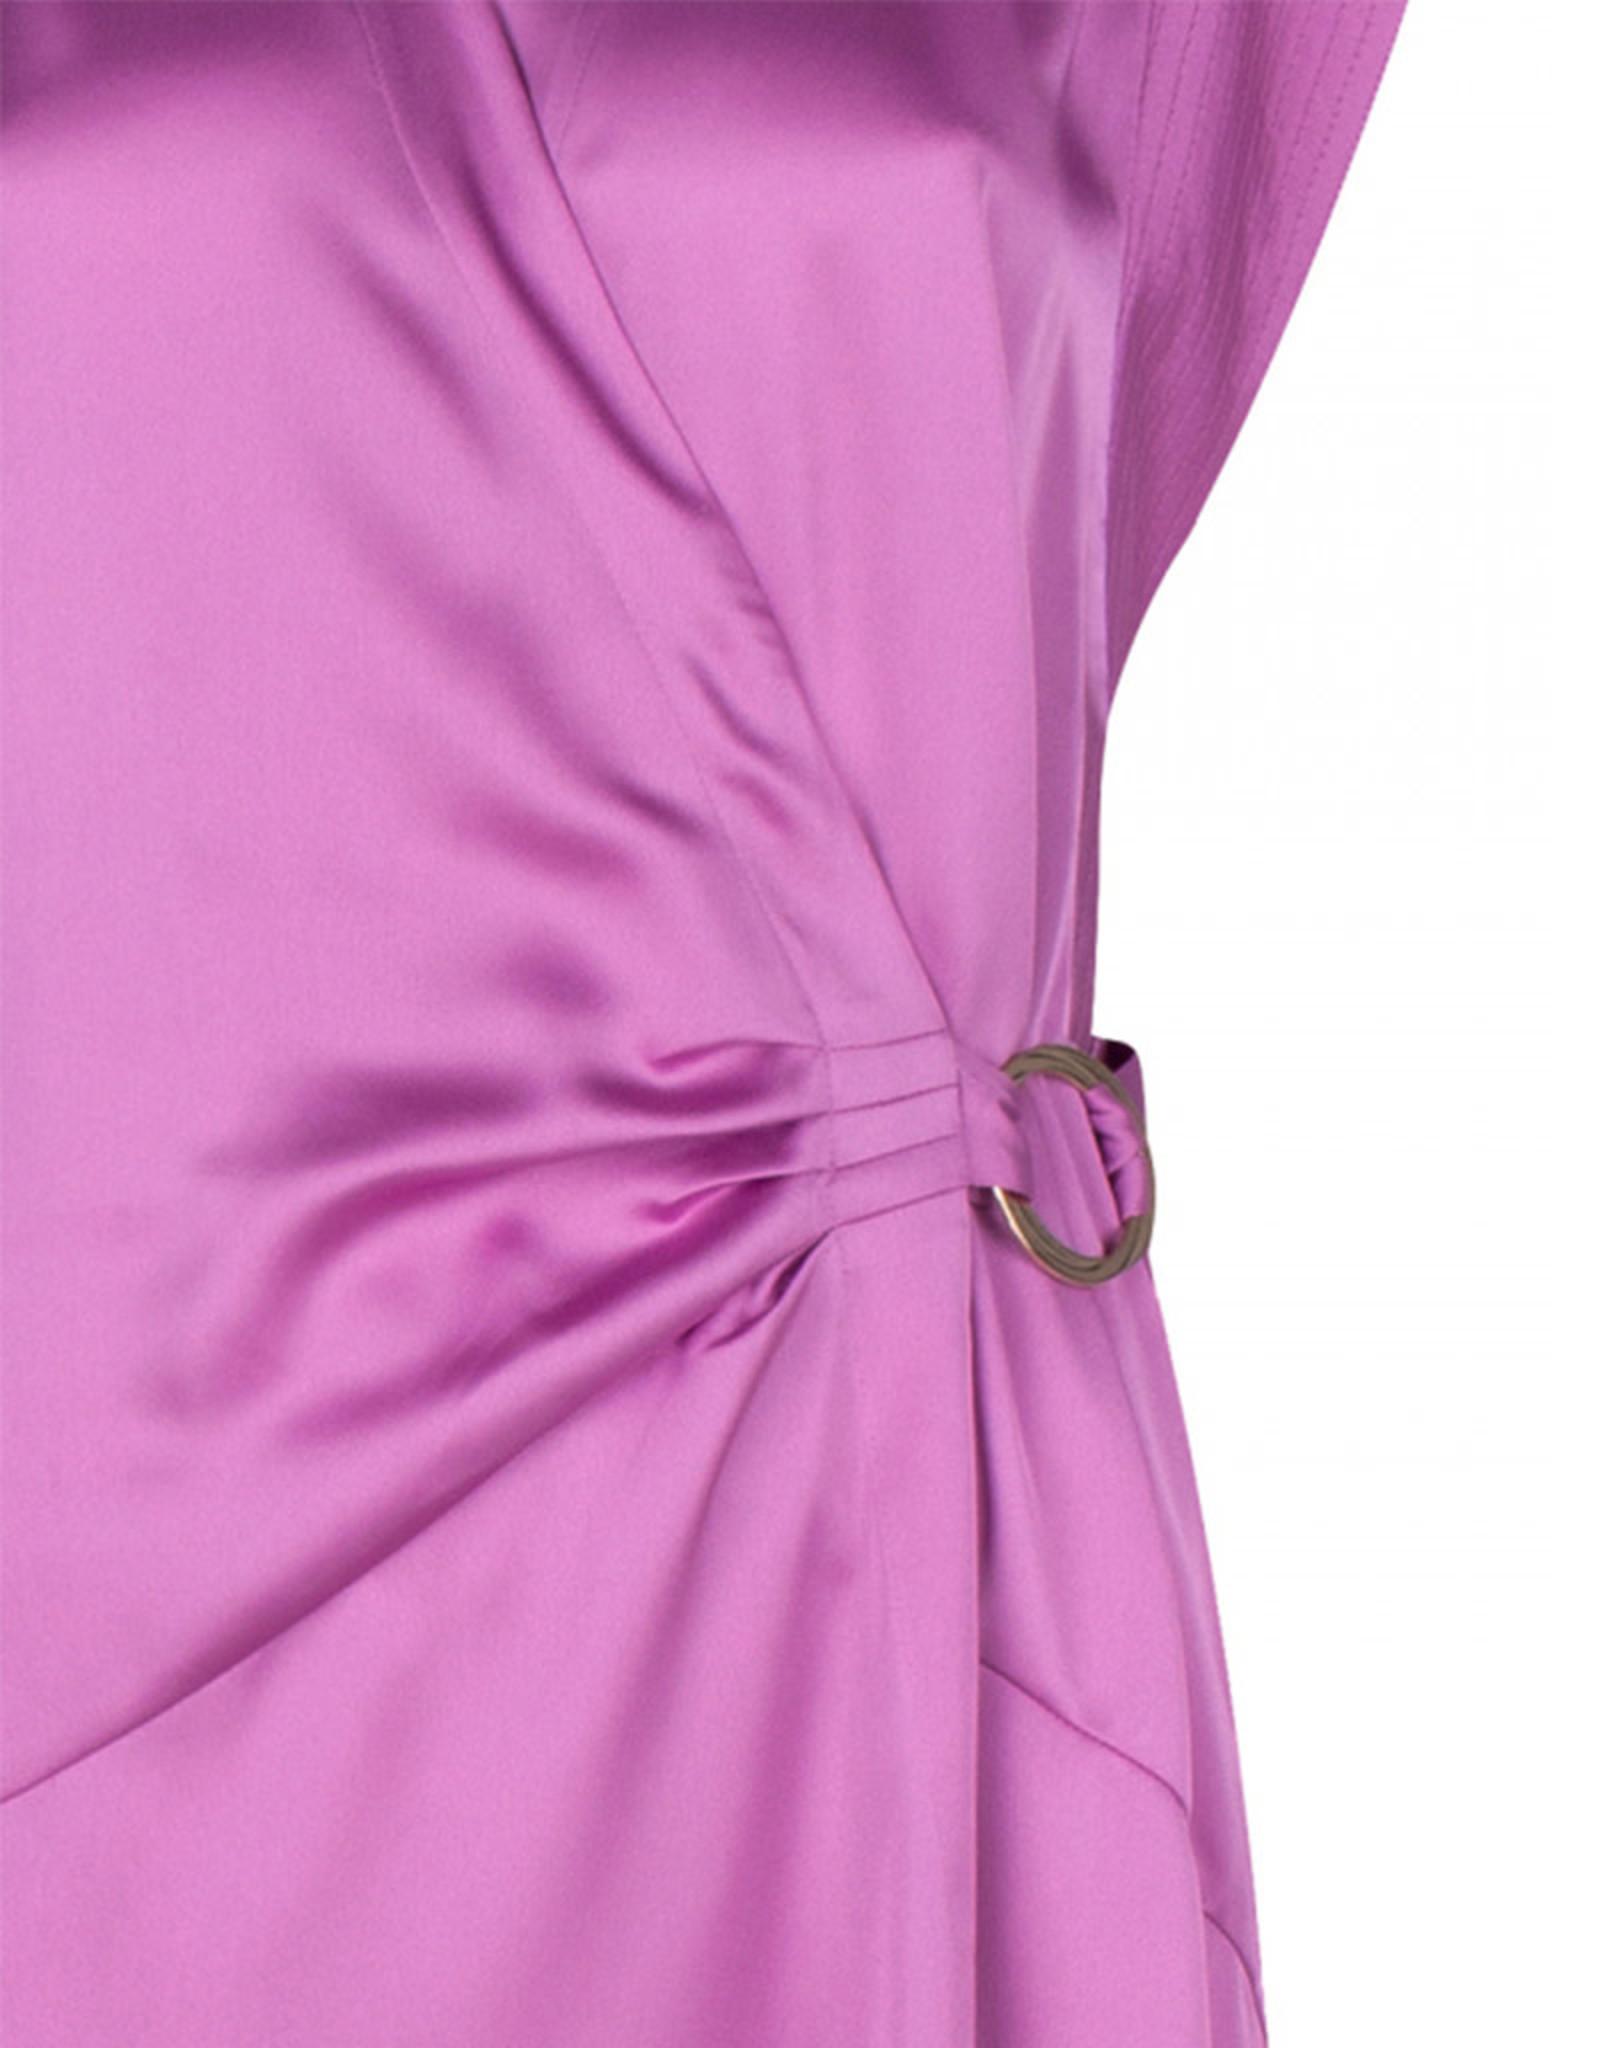 dante6 Rouet Dress